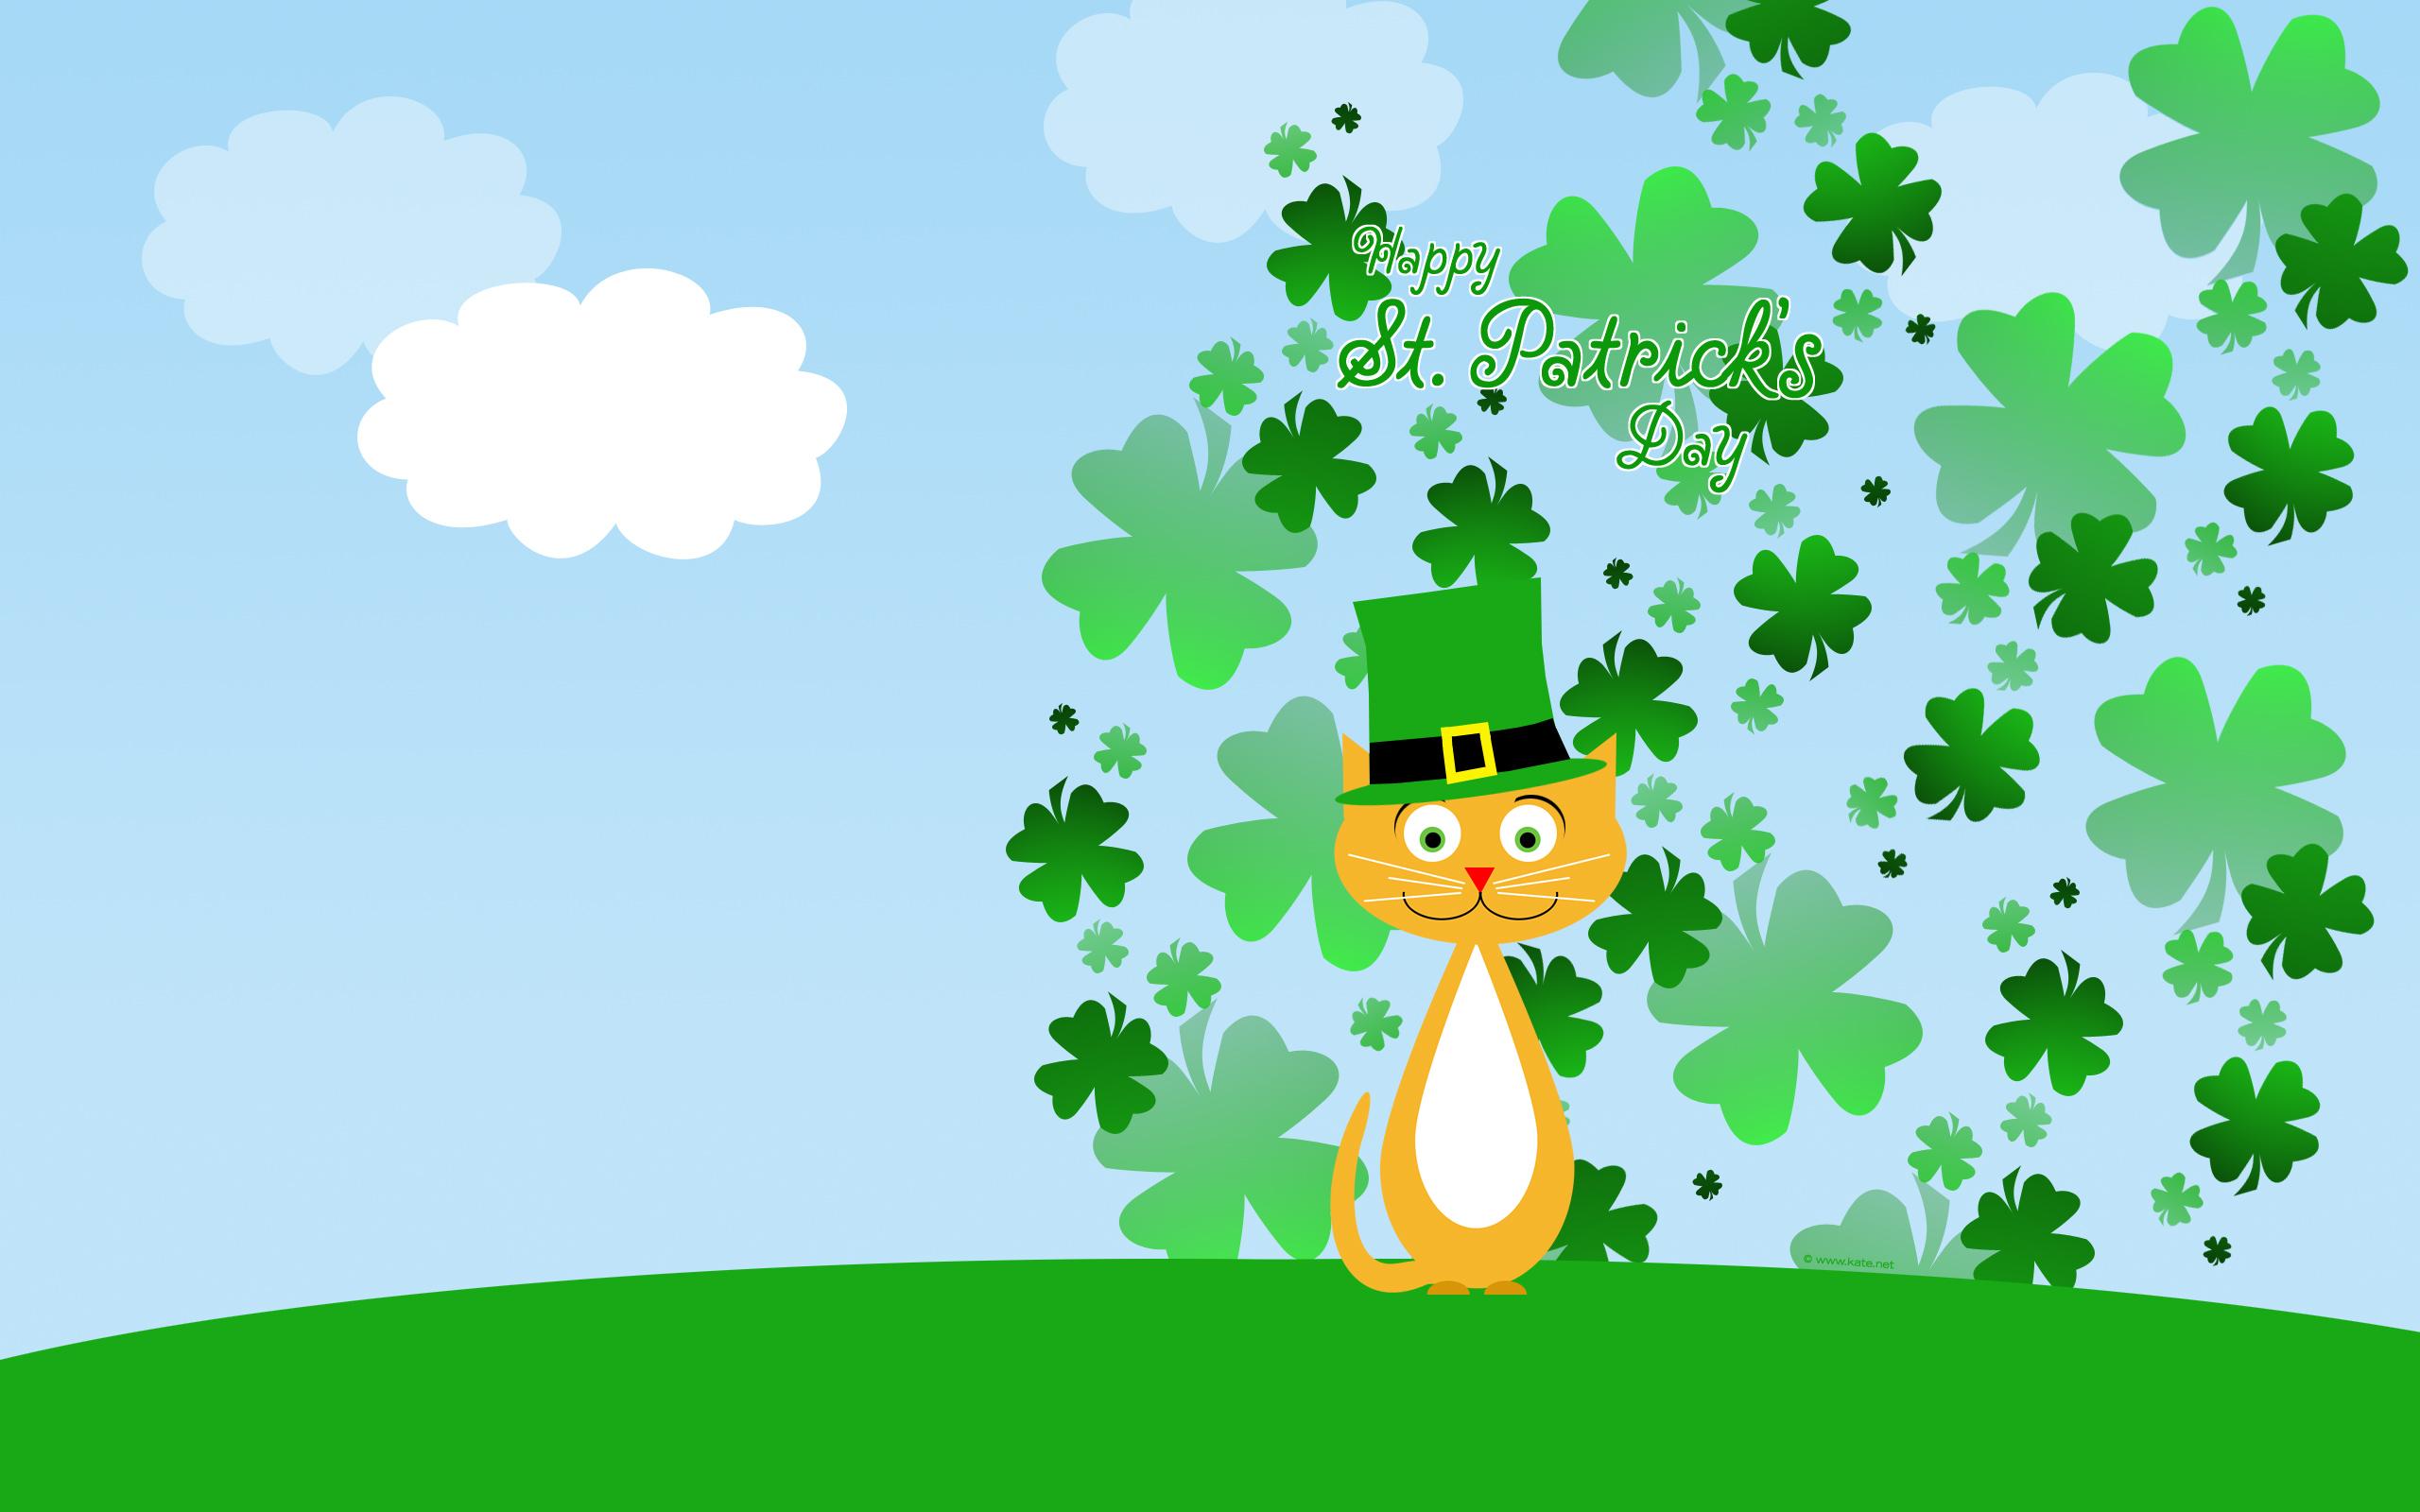 ... st patrick s day cat in shamrocks wallpaper kate net created 2 24 09